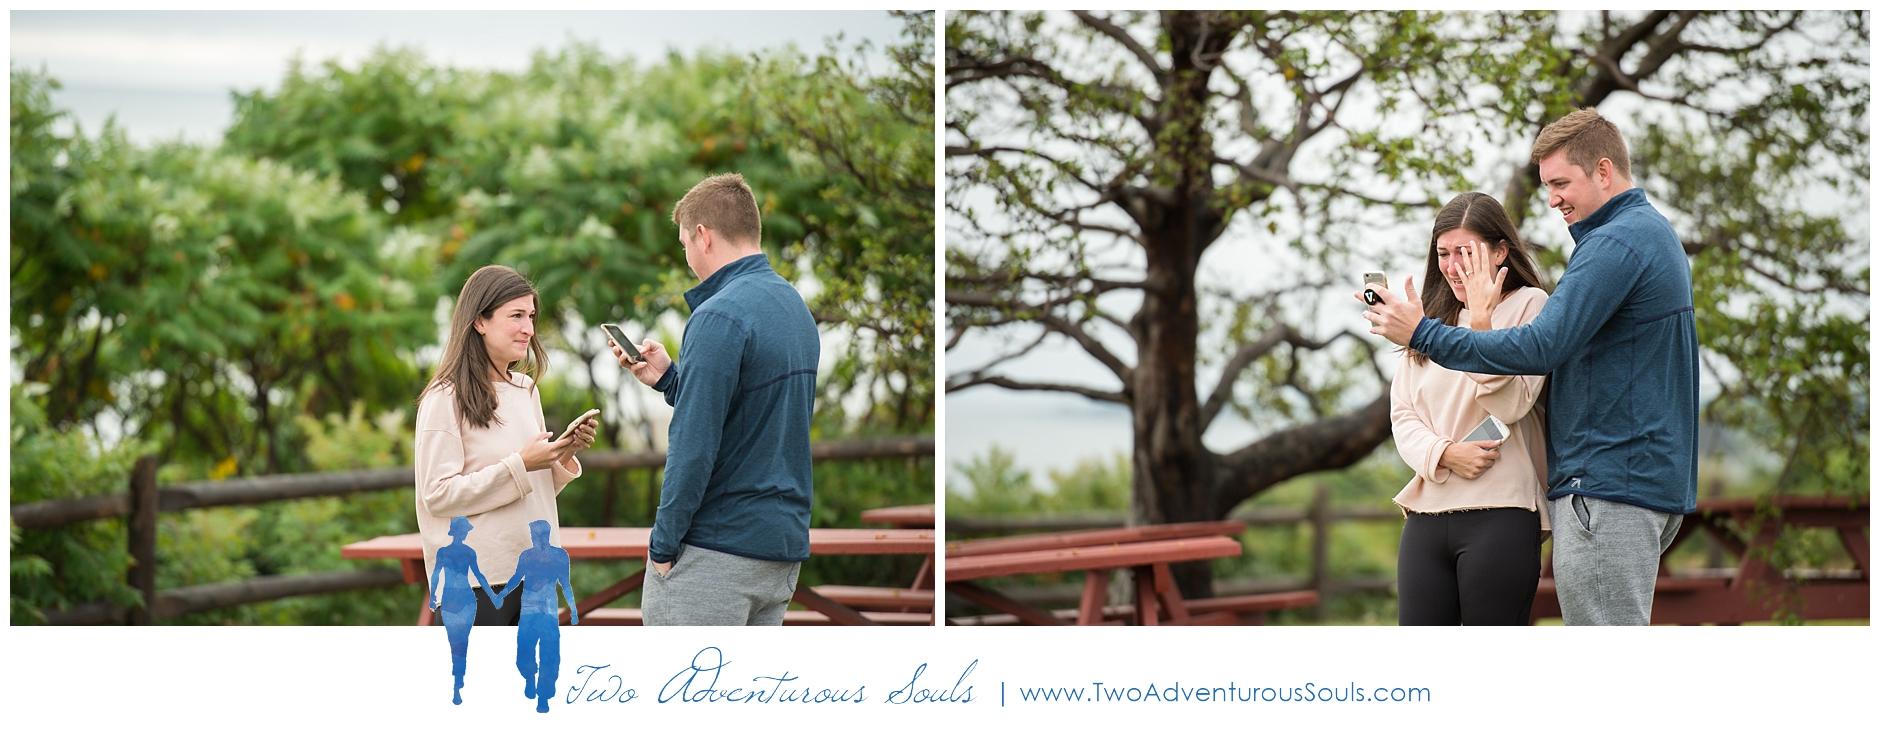 Portland Headlight Surprise Proposal by Maine Wedding Photographers - Two Adventurous Souls -